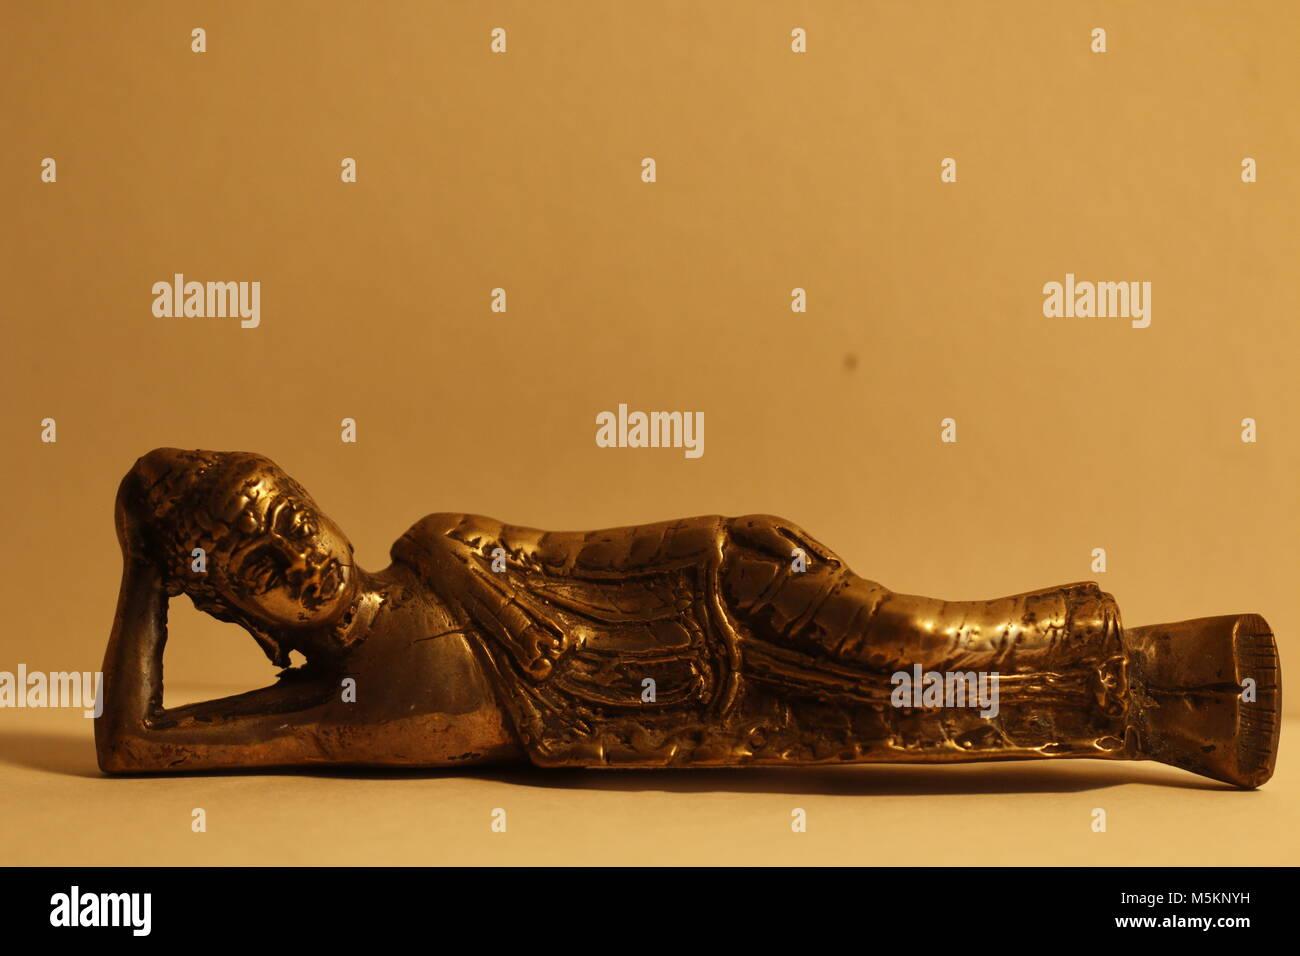 Resting Buddha statue - Stock Image